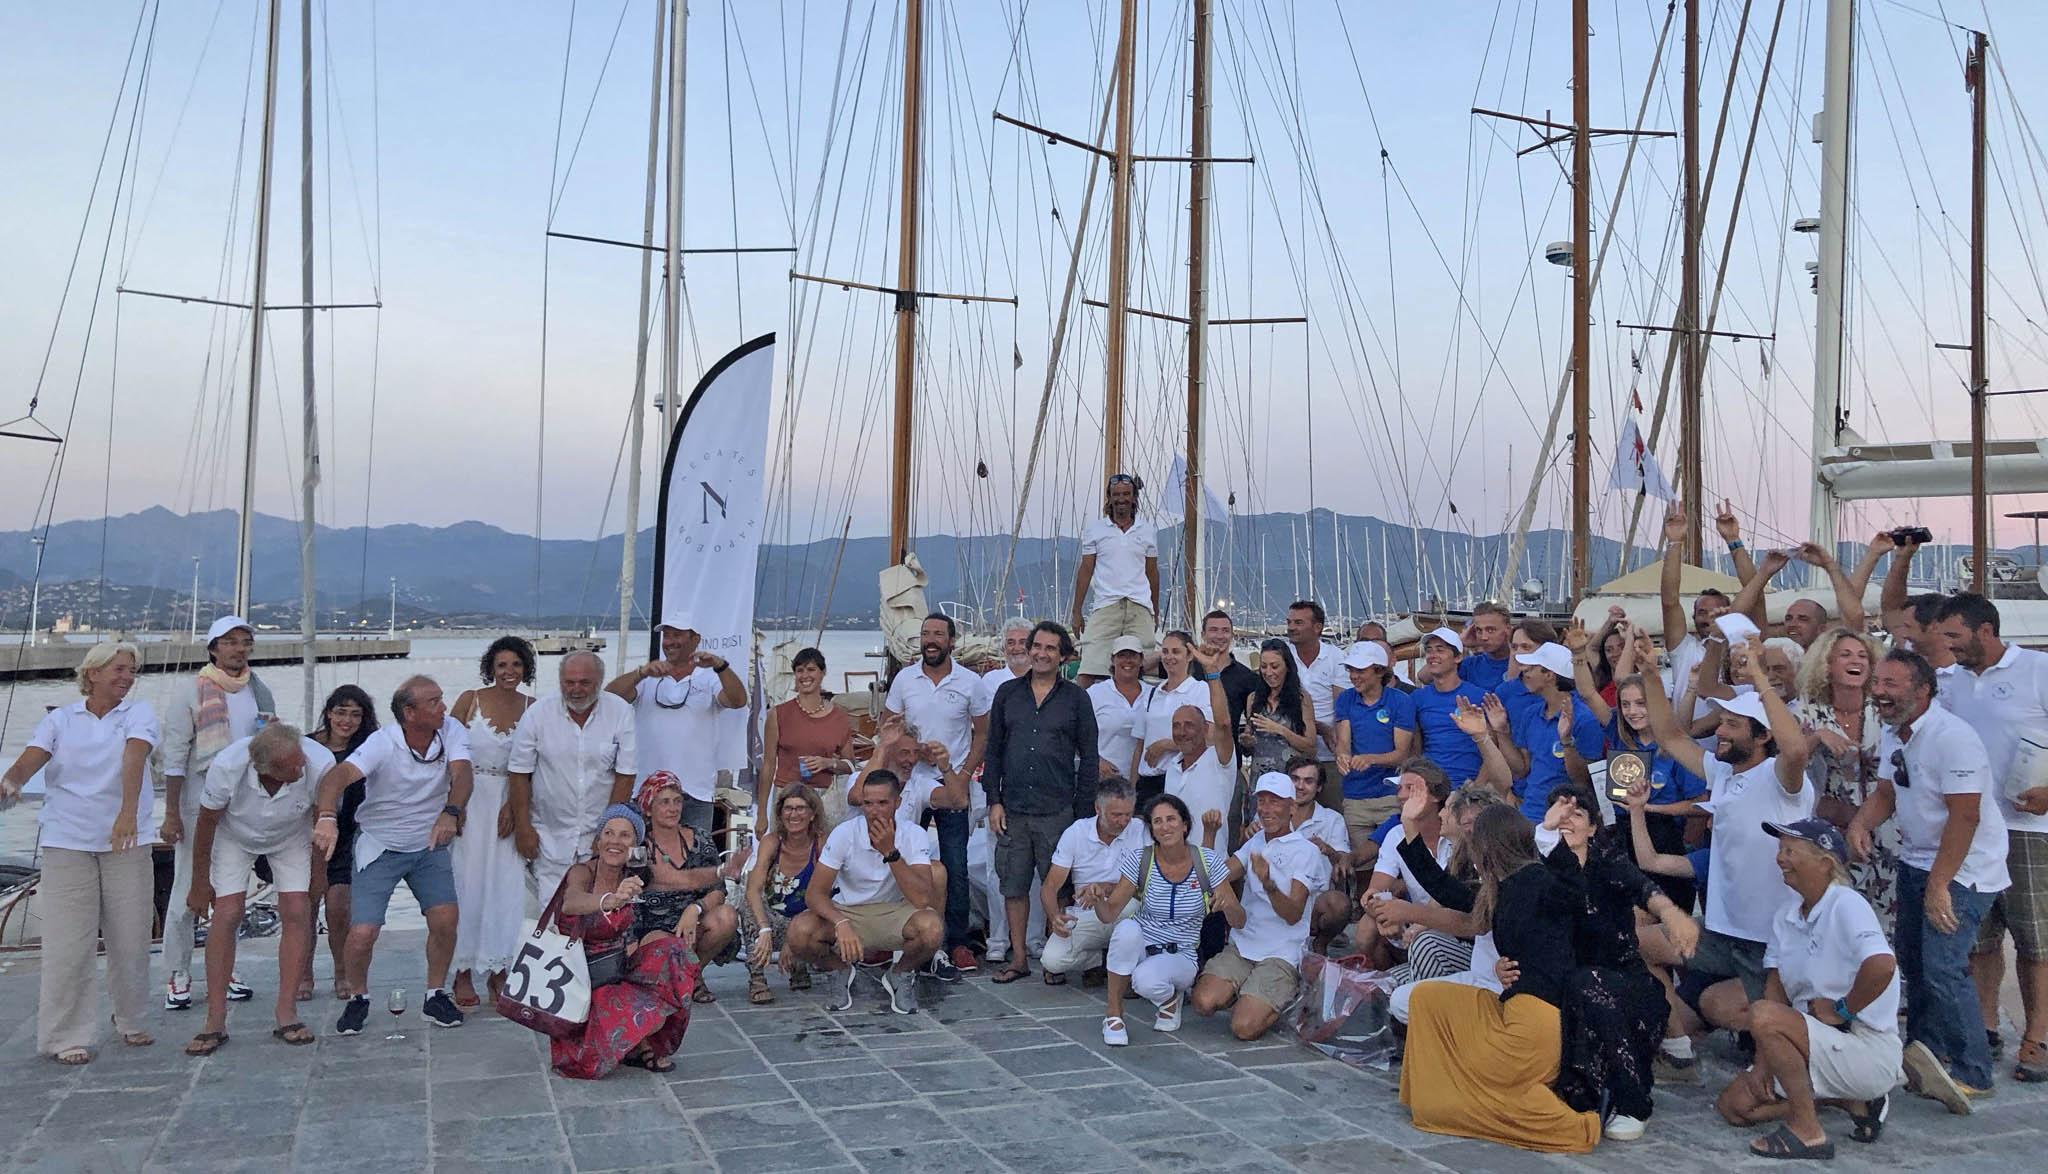 Régates Napoléon 2020 Ajaccio Port Tino Rossi photo Katia Kulawick-Assante DR